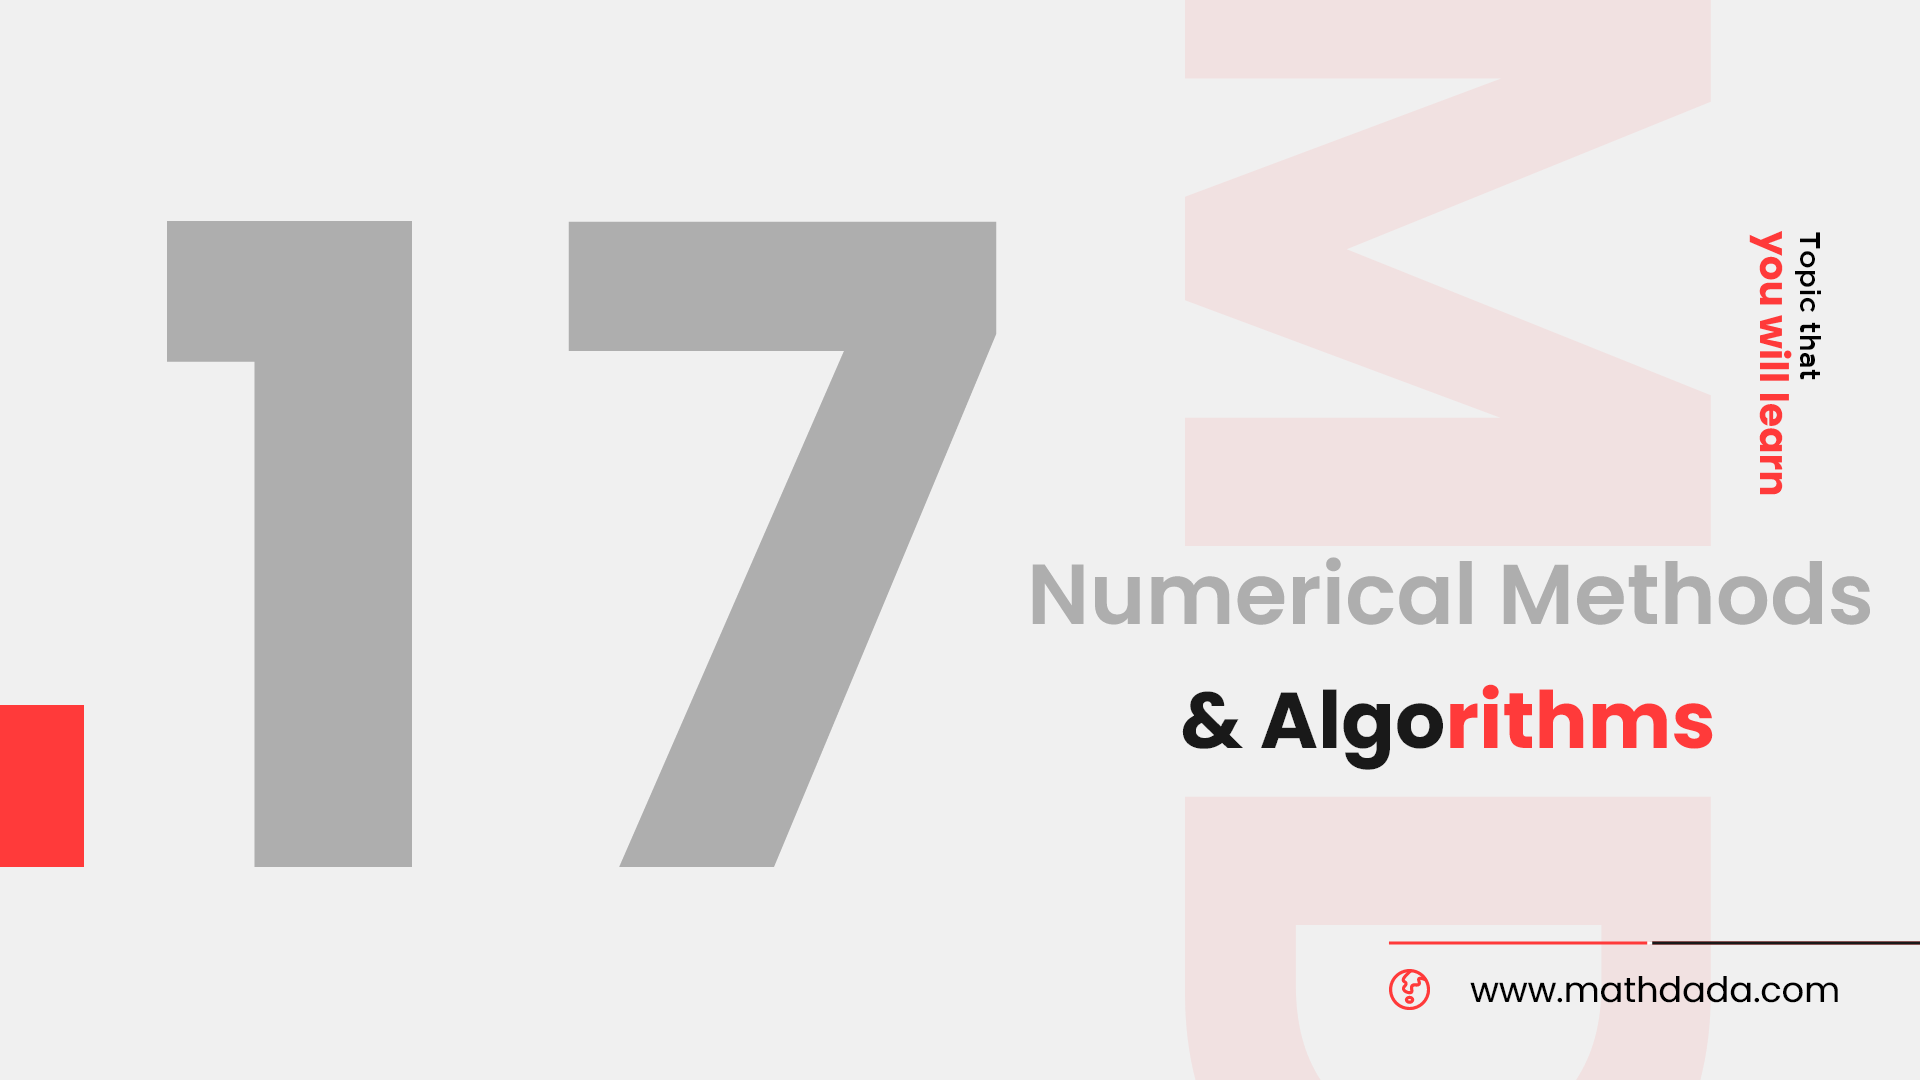 Numerical Methods & Algorithms